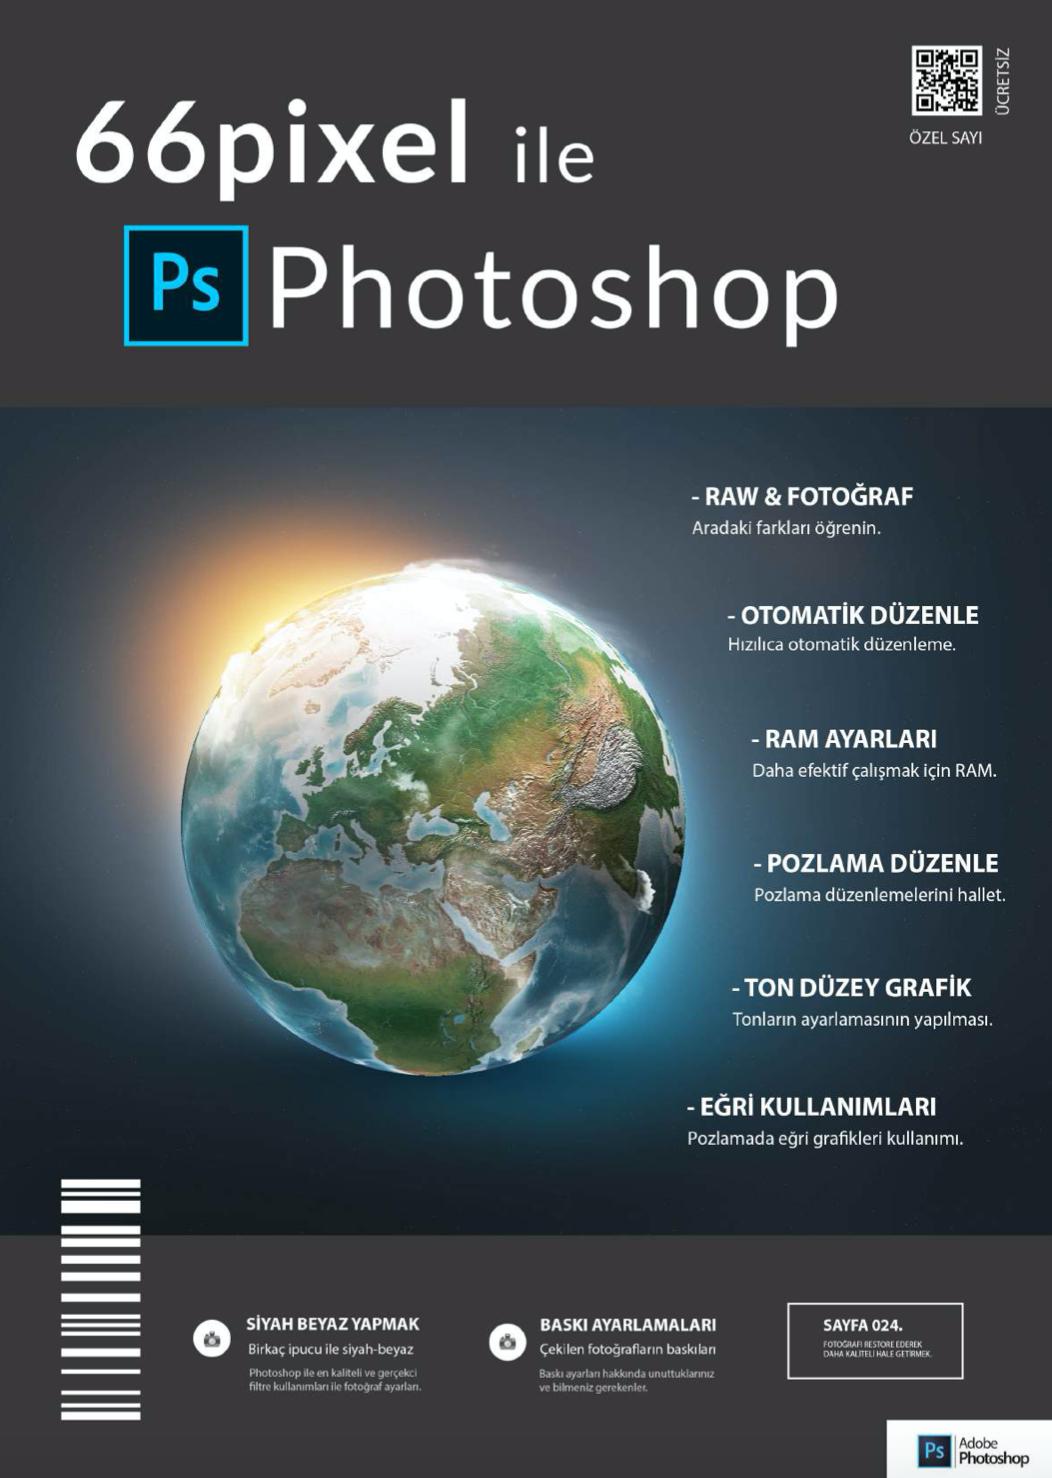 66pixel-photoshop-kapak-2020